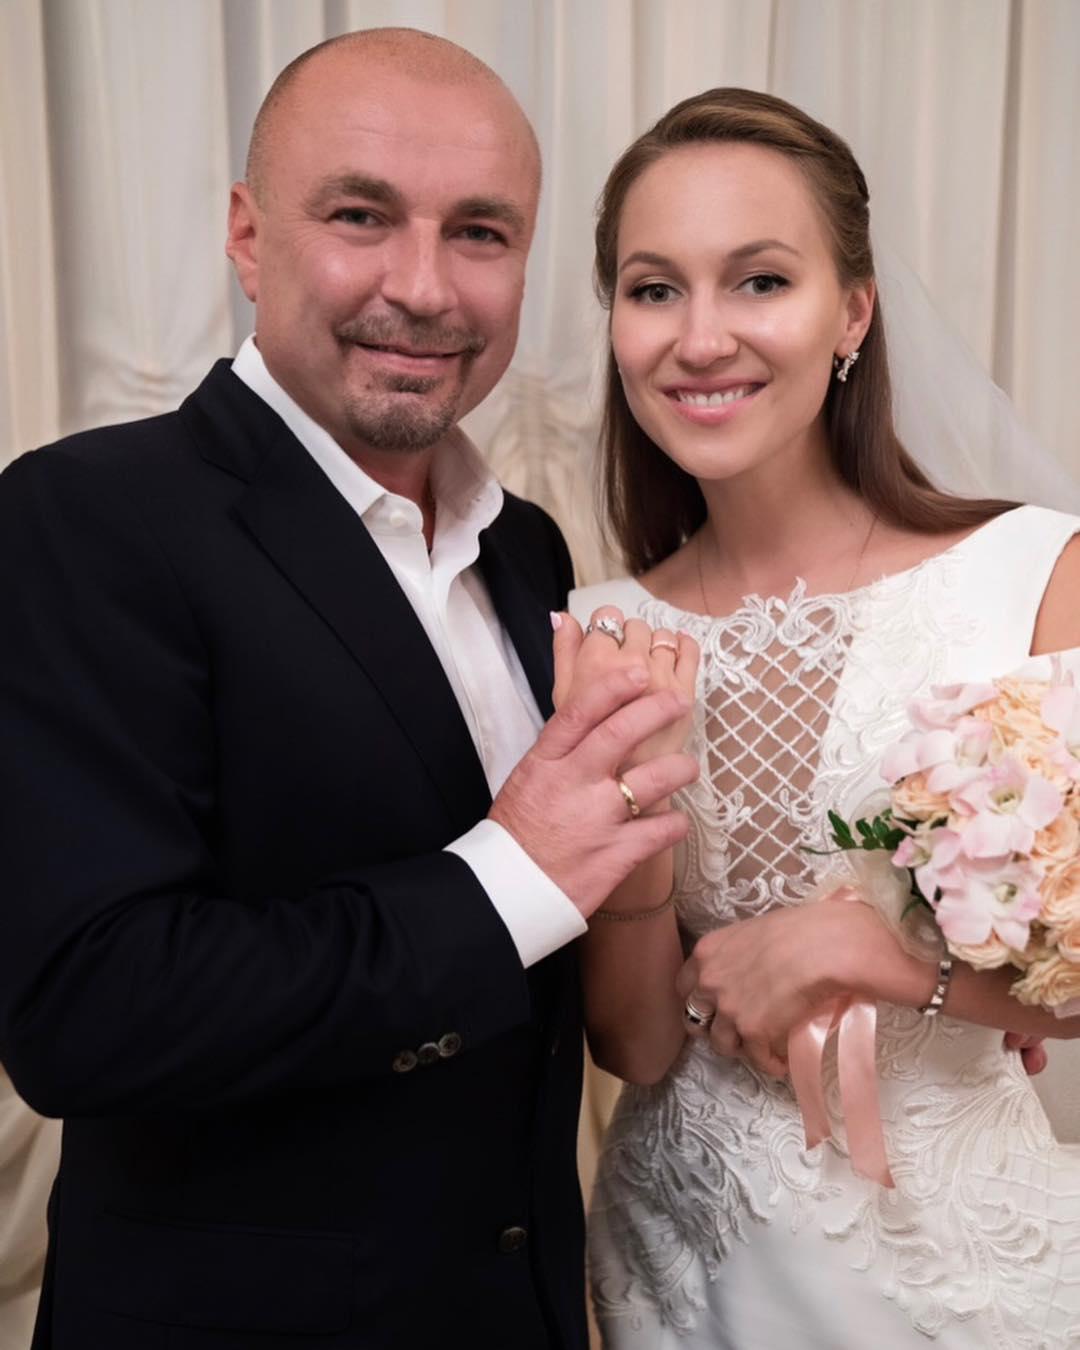 Александр Жулин стал отцом в третий раз | Журнал GraziaMagazine